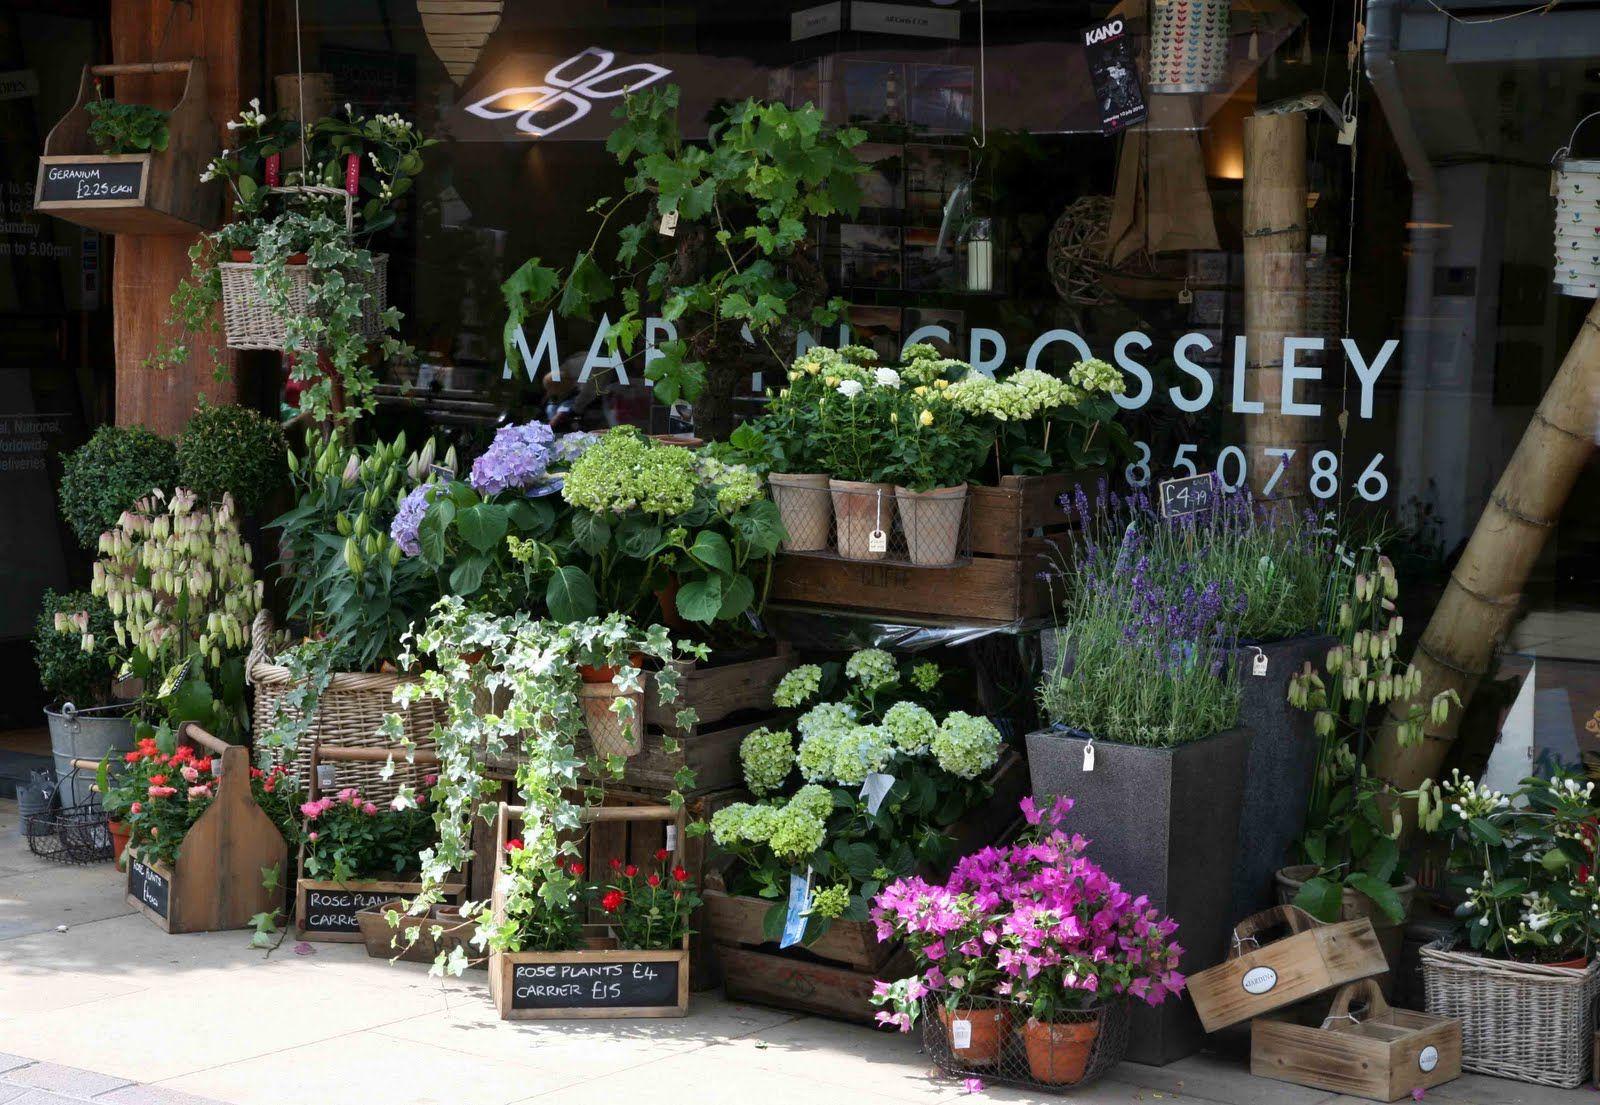 The vale of aigburth gardens pinterest flower shops flower martyn crossley the florist windsor via sally page izmirmasajfo Gallery